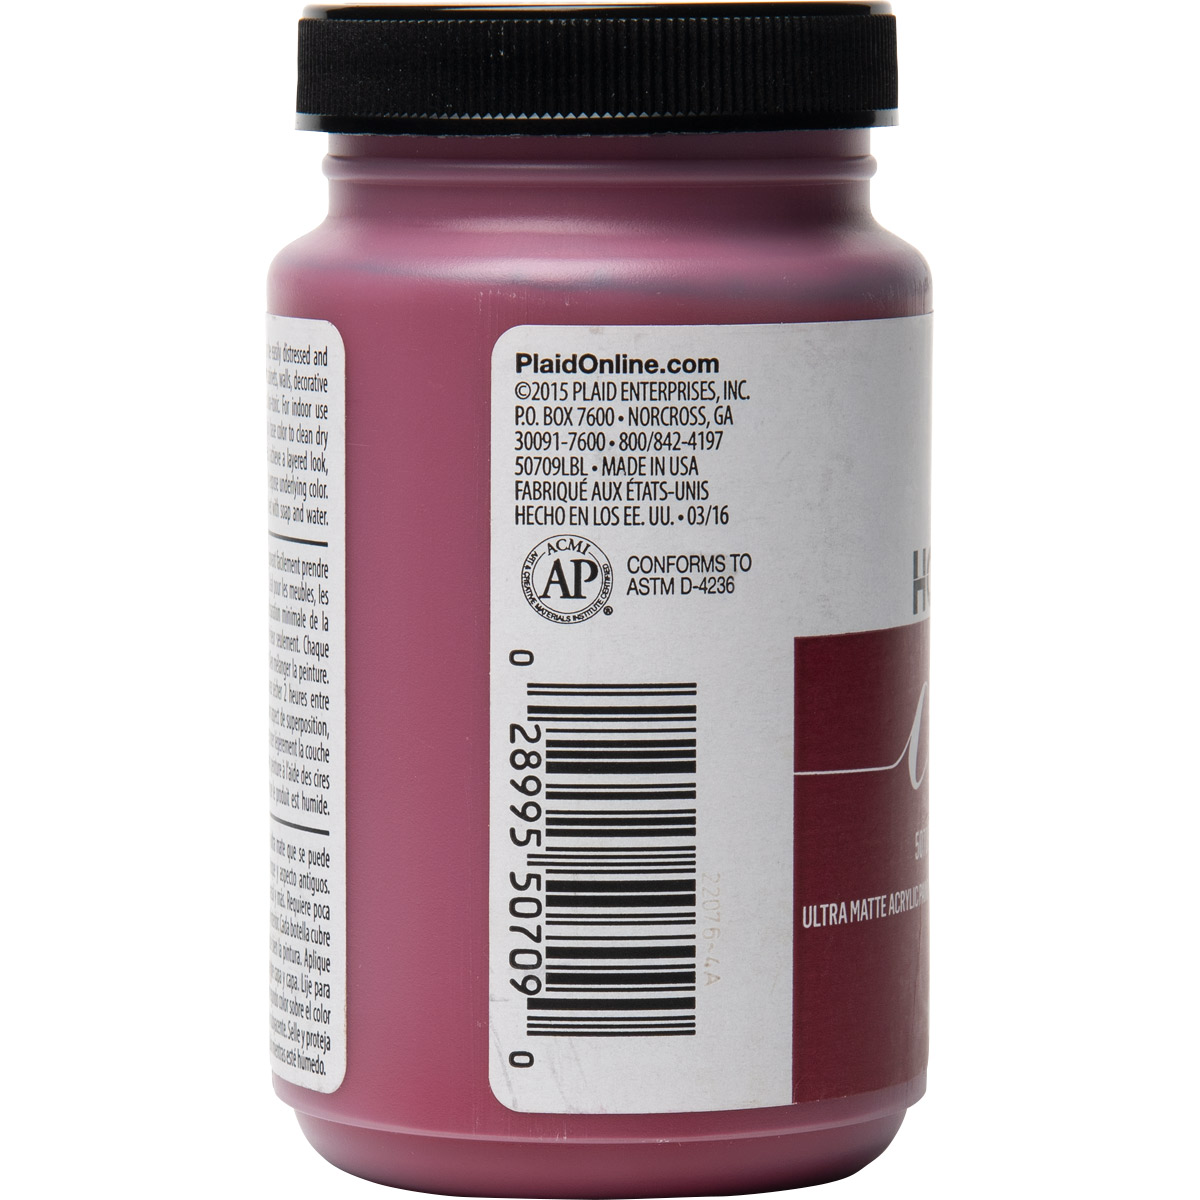 FolkArt ® Home Decor™ Chalk - Bordeaux, 8 oz.